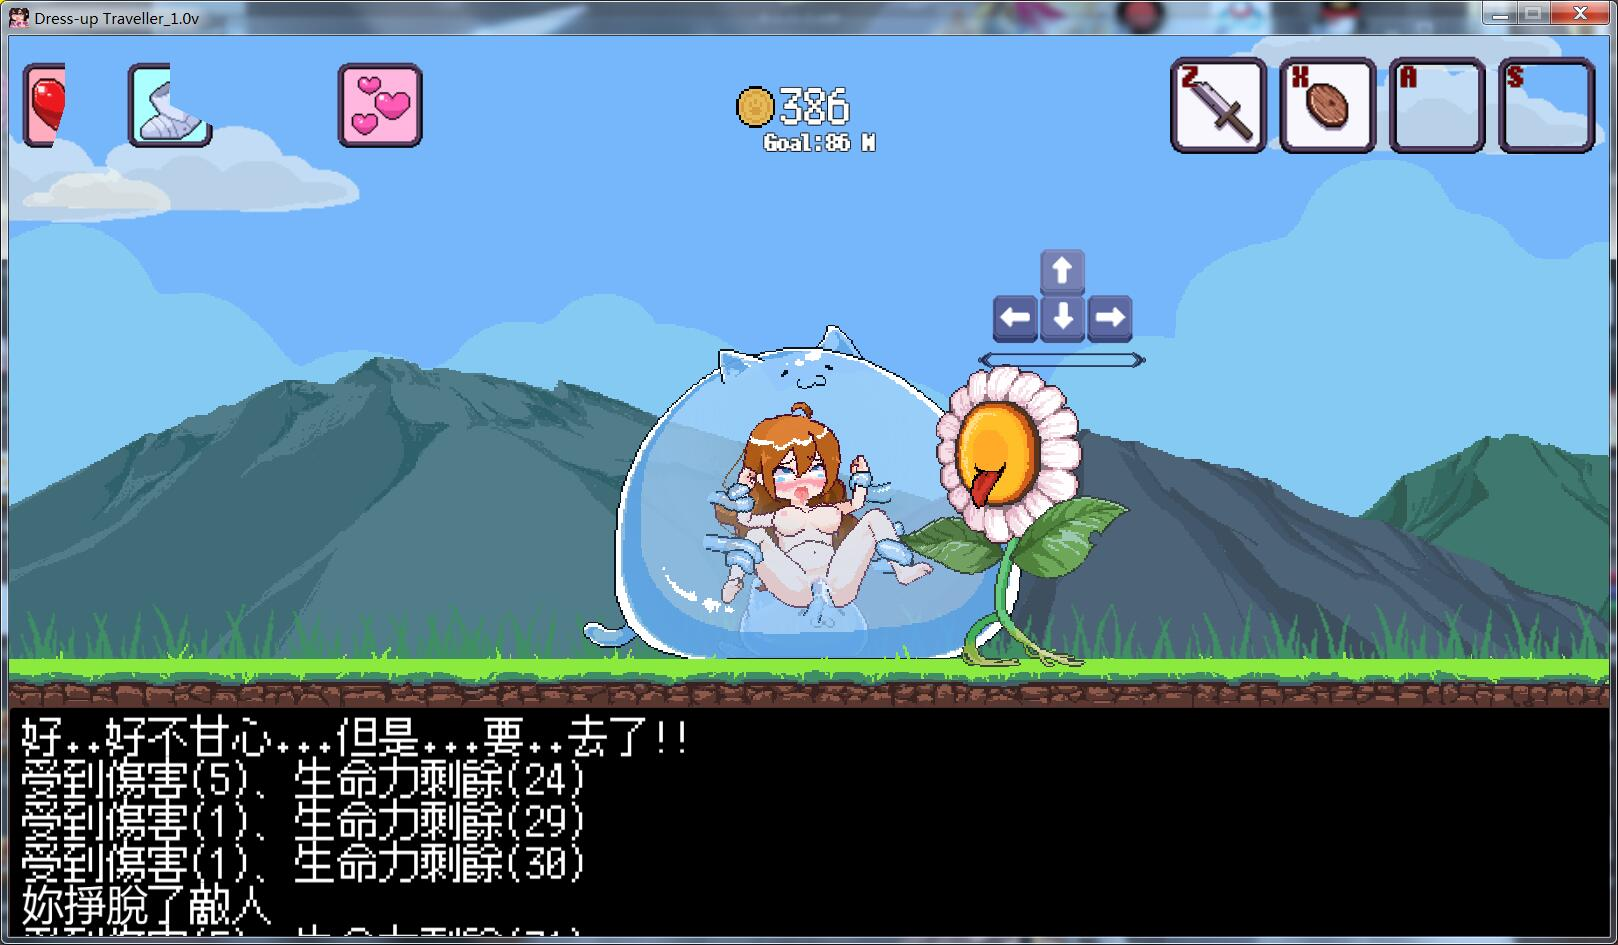 【ACT/中文/全动态】换装冒险者!V6.28 官方中文更新版【更新】【300M】